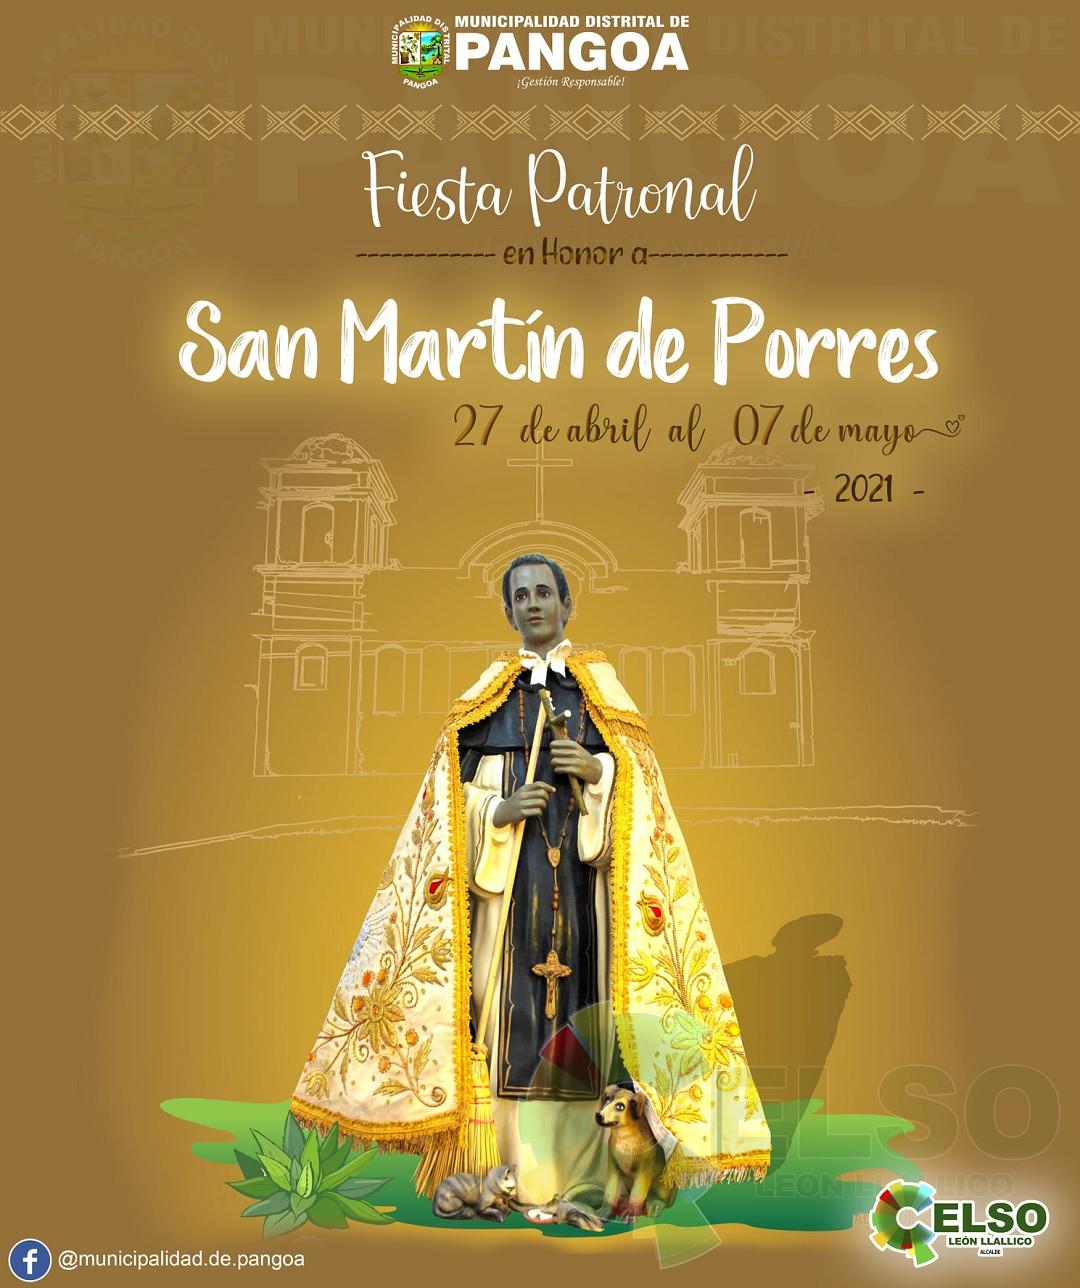 San Martin de Pangoa